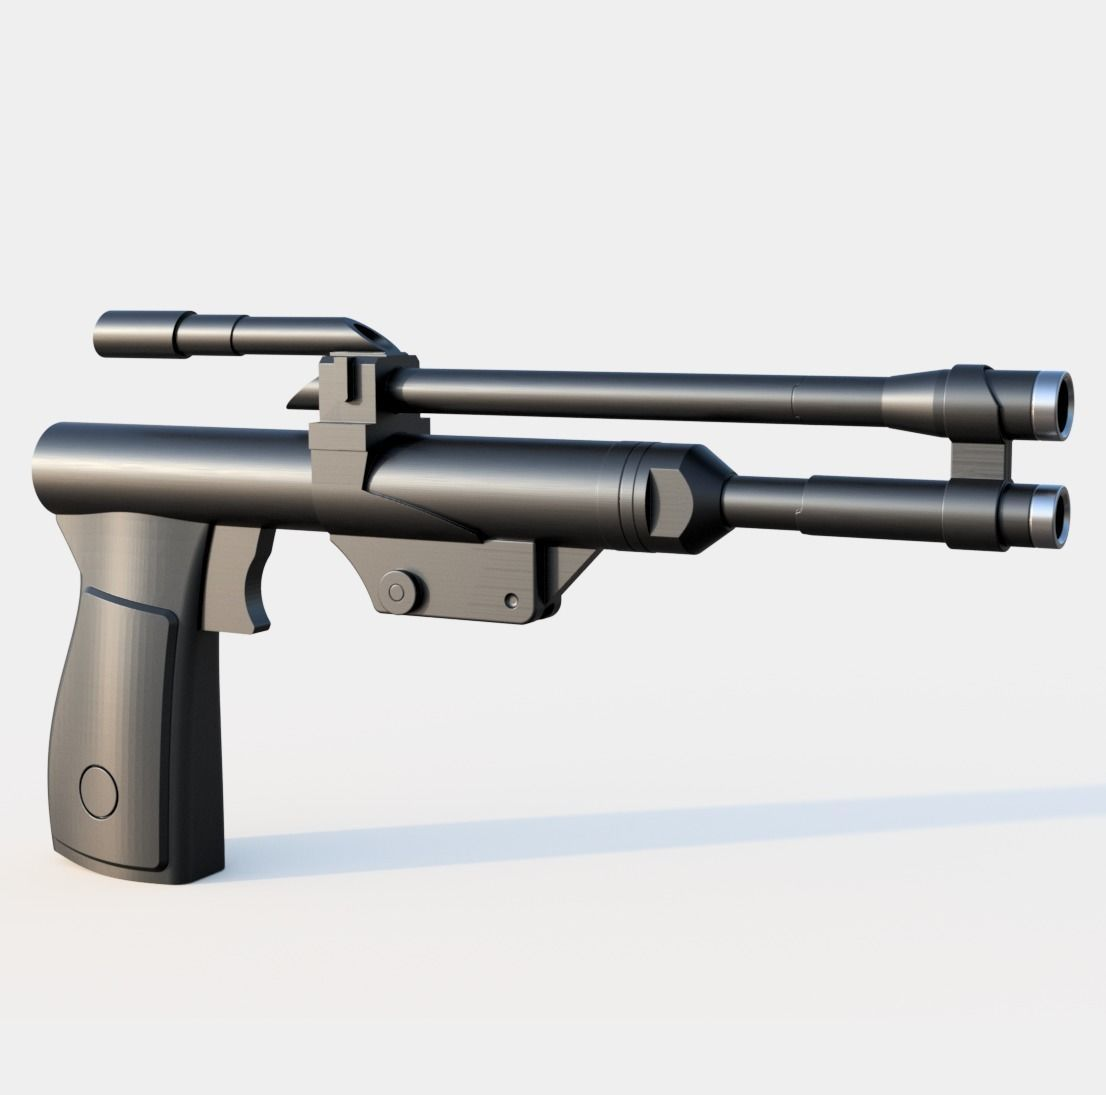 New Boba Fett Blaster